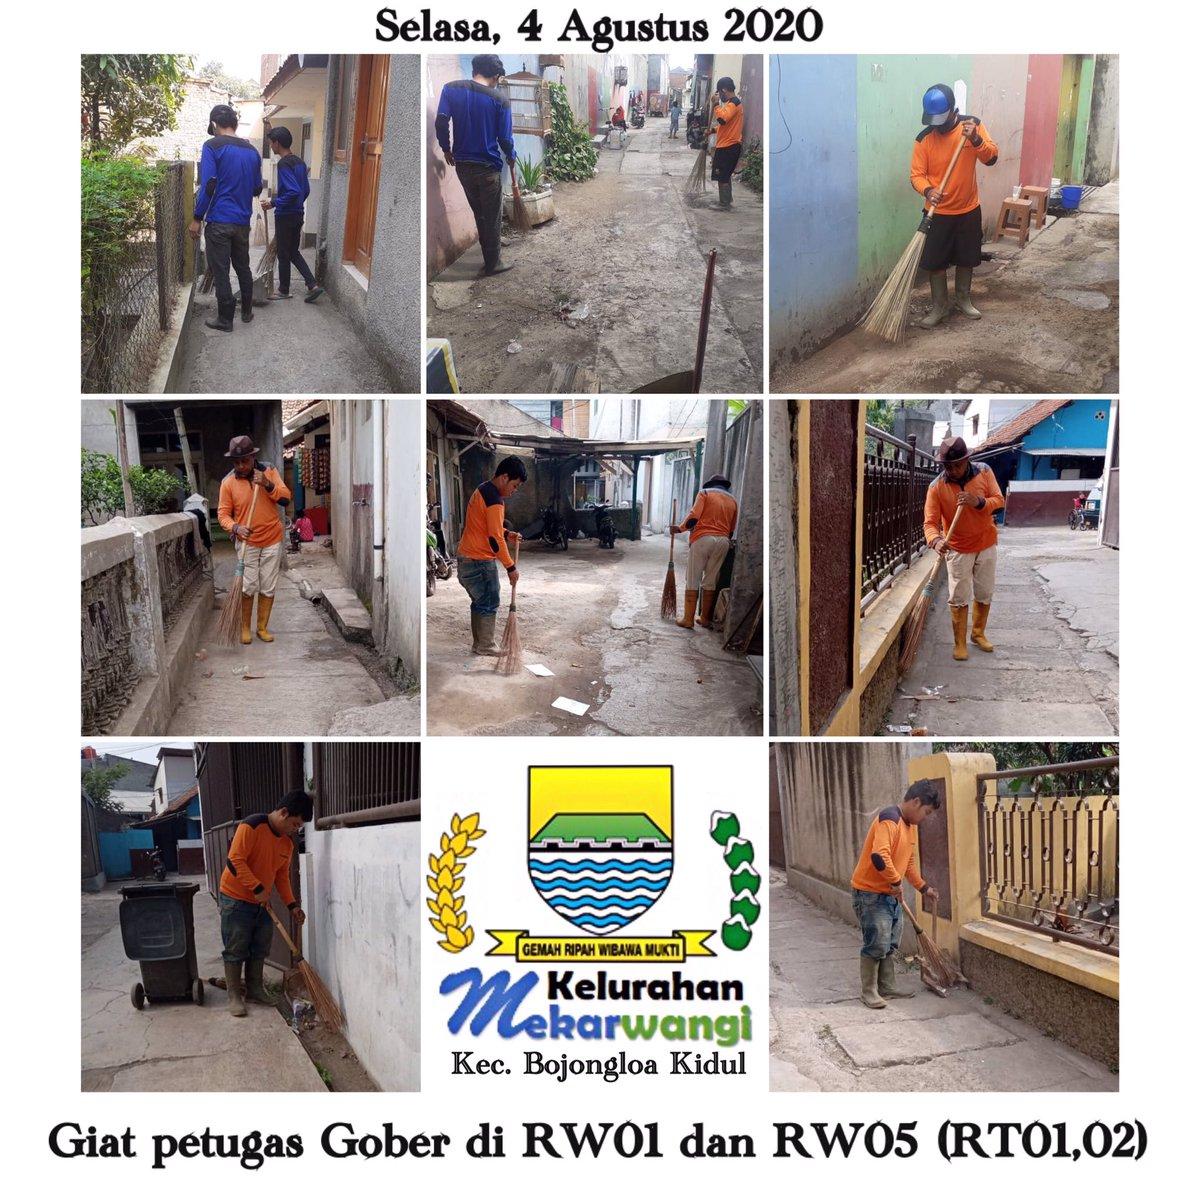 Giat petugas Gober pagi pembersihan jalan lingkungan di RW01 dan RW05 (RT01,02) Kelurahan Mekarwangi Kecamatan Bojongloa Kidul Kota Bandung pada hari Selasa tanggal 4 Agustus 2020 @OdedMD @kangyanamulyana @dlhk_kotabdg @pembdg @kecbojkid_ktbdg #bandungjuara #tetapsemangat pic.twitter.com/wh5Dgiz61P